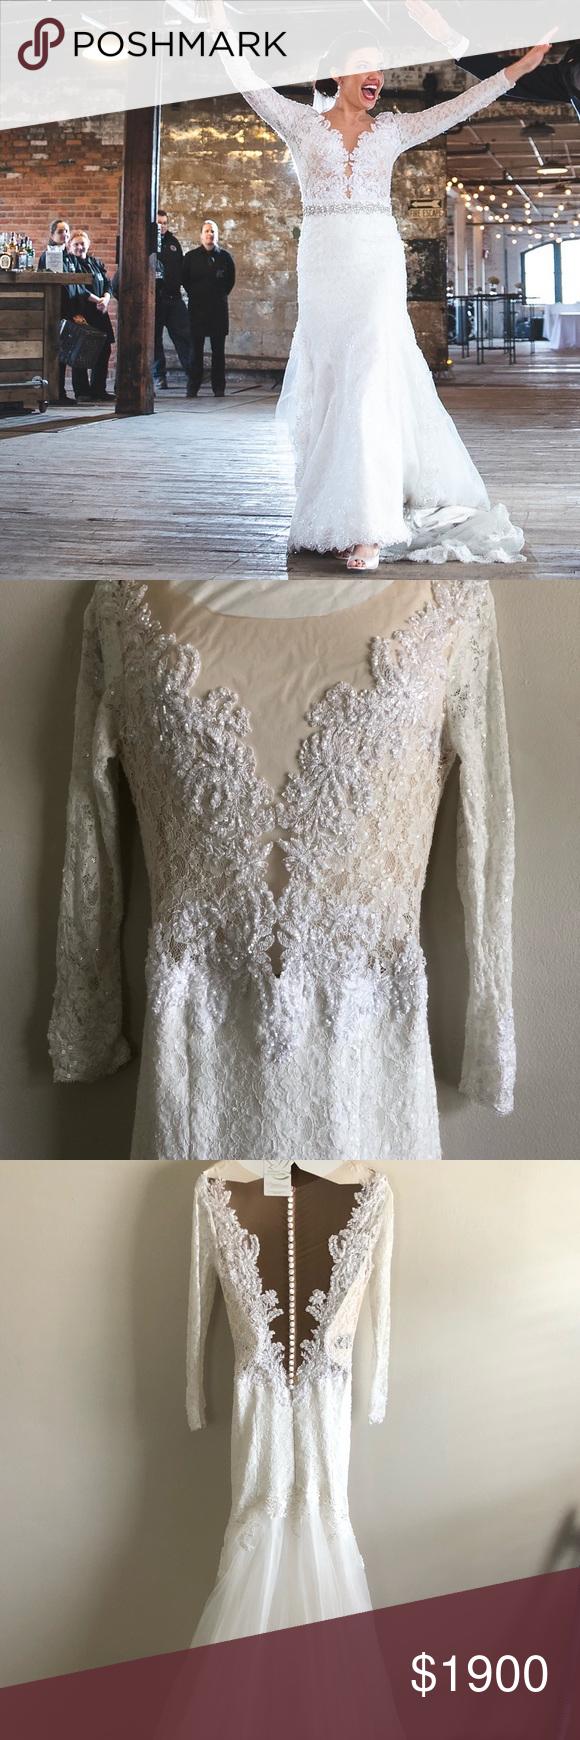 I just added this listing on poshmark longsleeve lace wedding